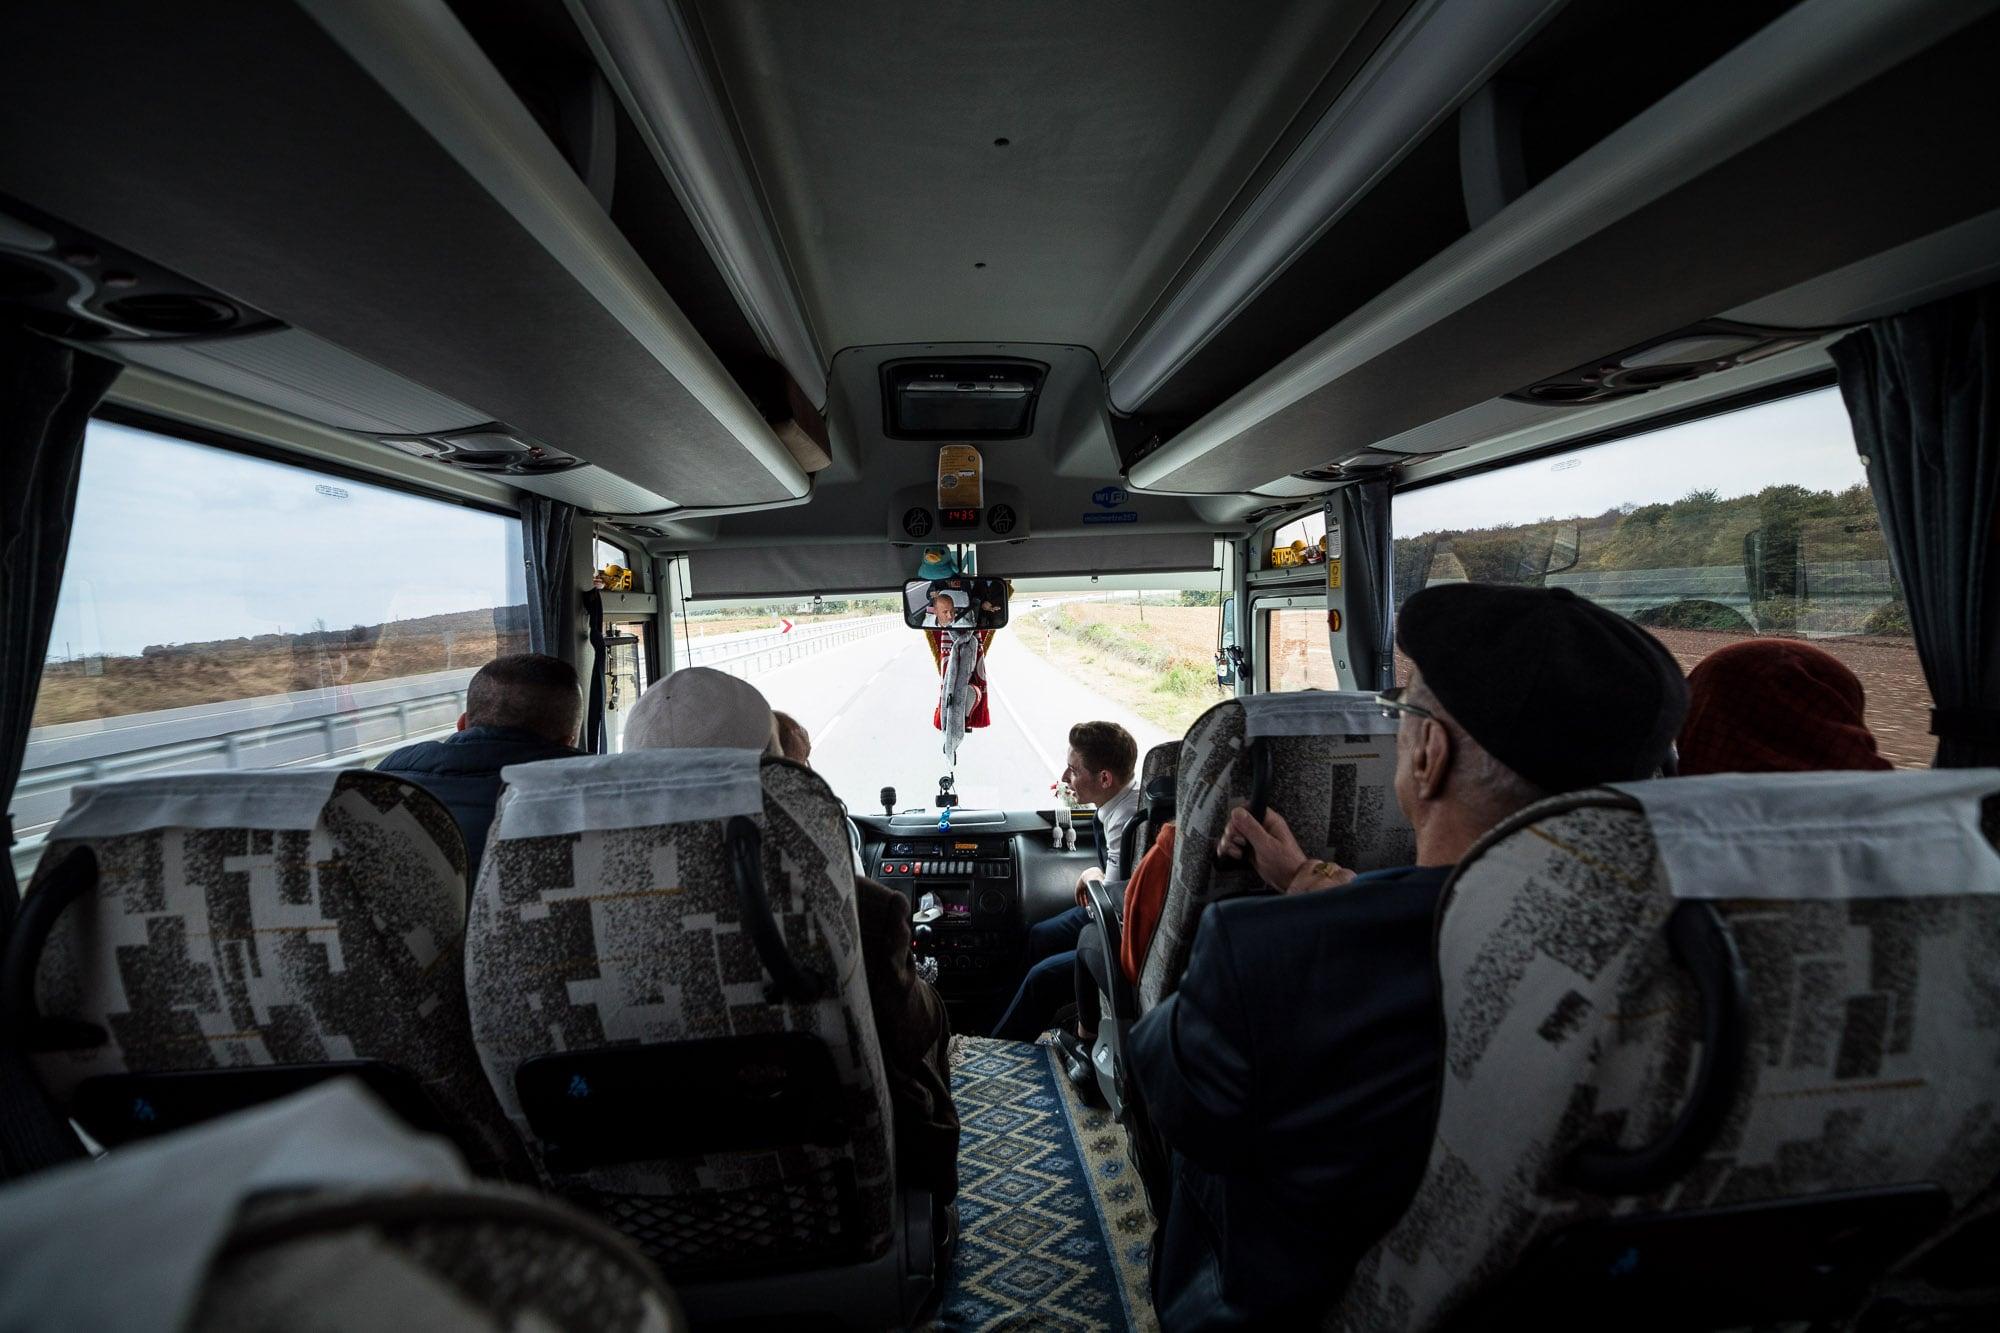 bus from Sinop to Samsun